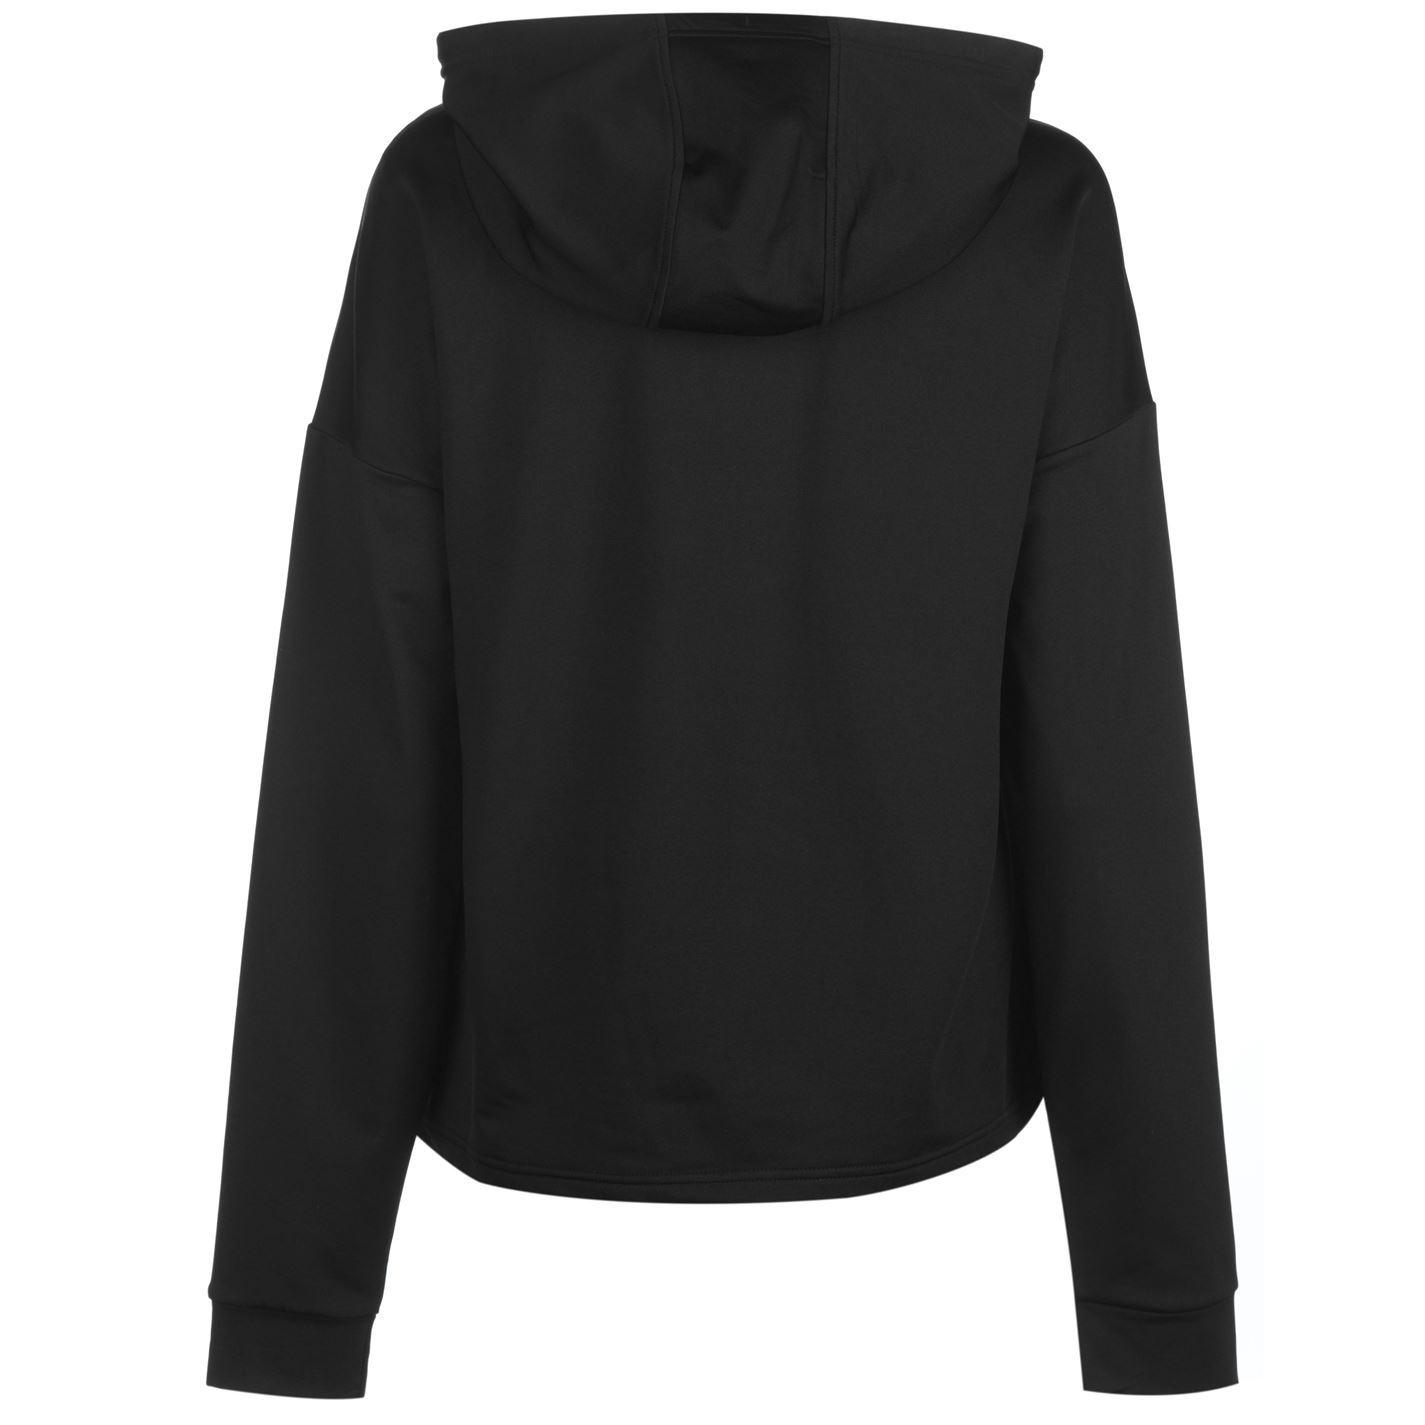 Pro abrigo Slouch Prendas Top Women Drawstring Hoodie de Usa Hooded dFxznwTqd